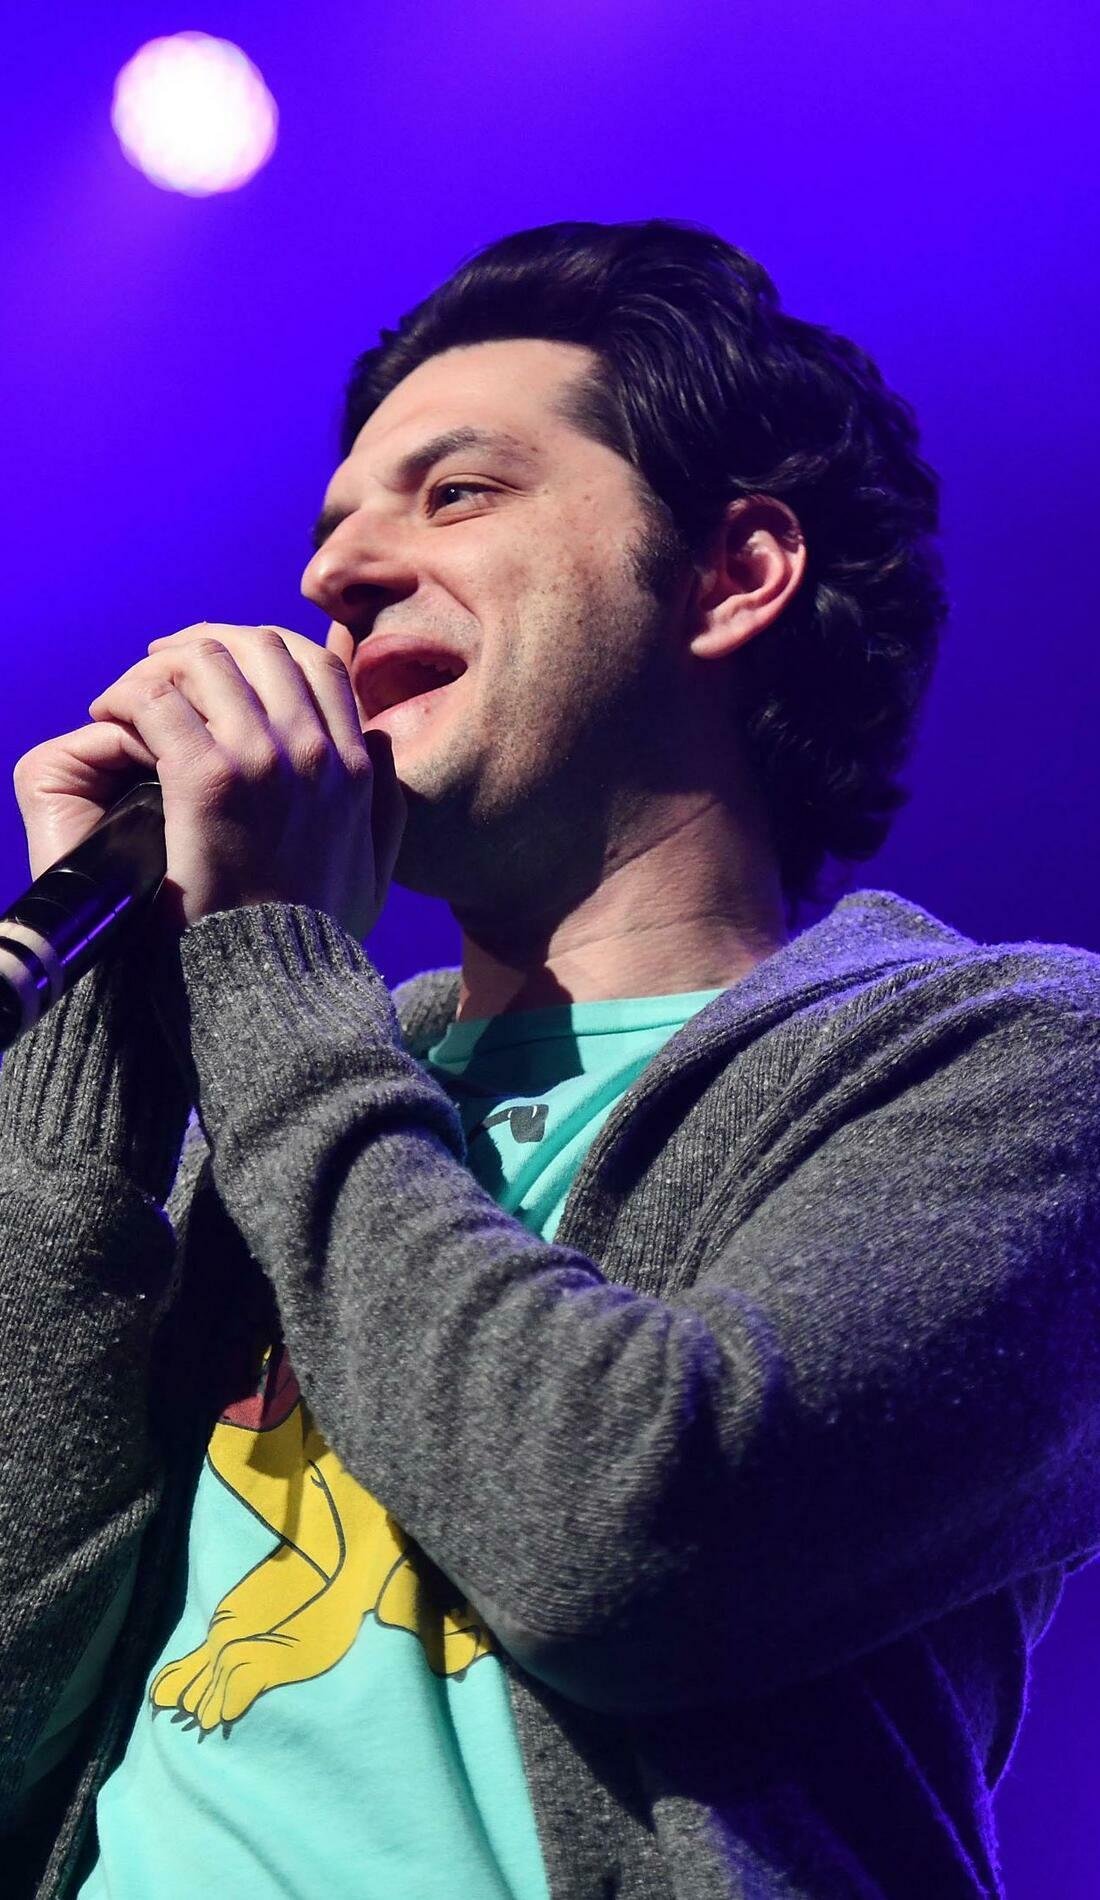 A Ben Schwartz live event